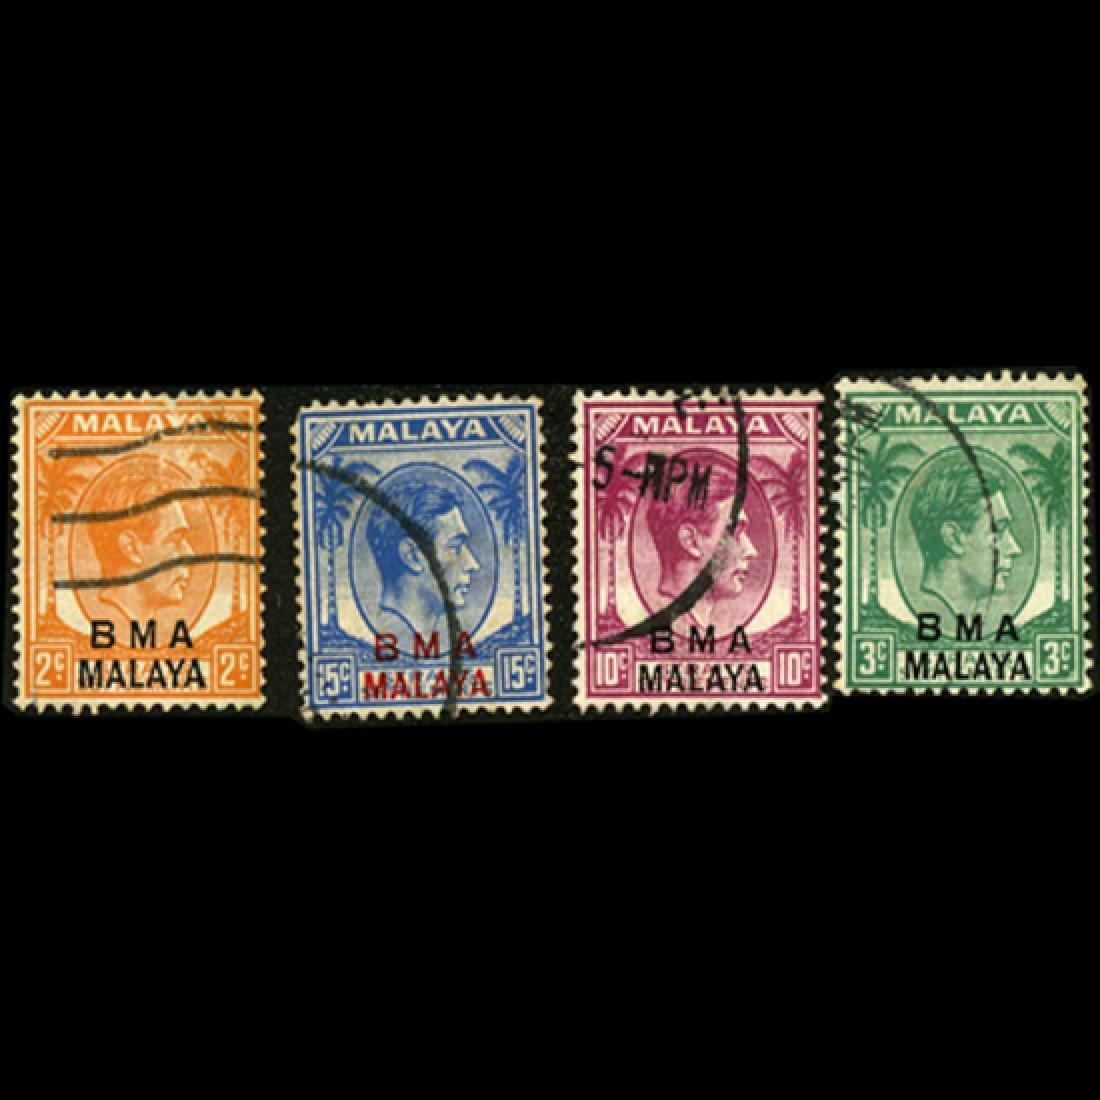 1945 GB Malaya George VII Stamp Set